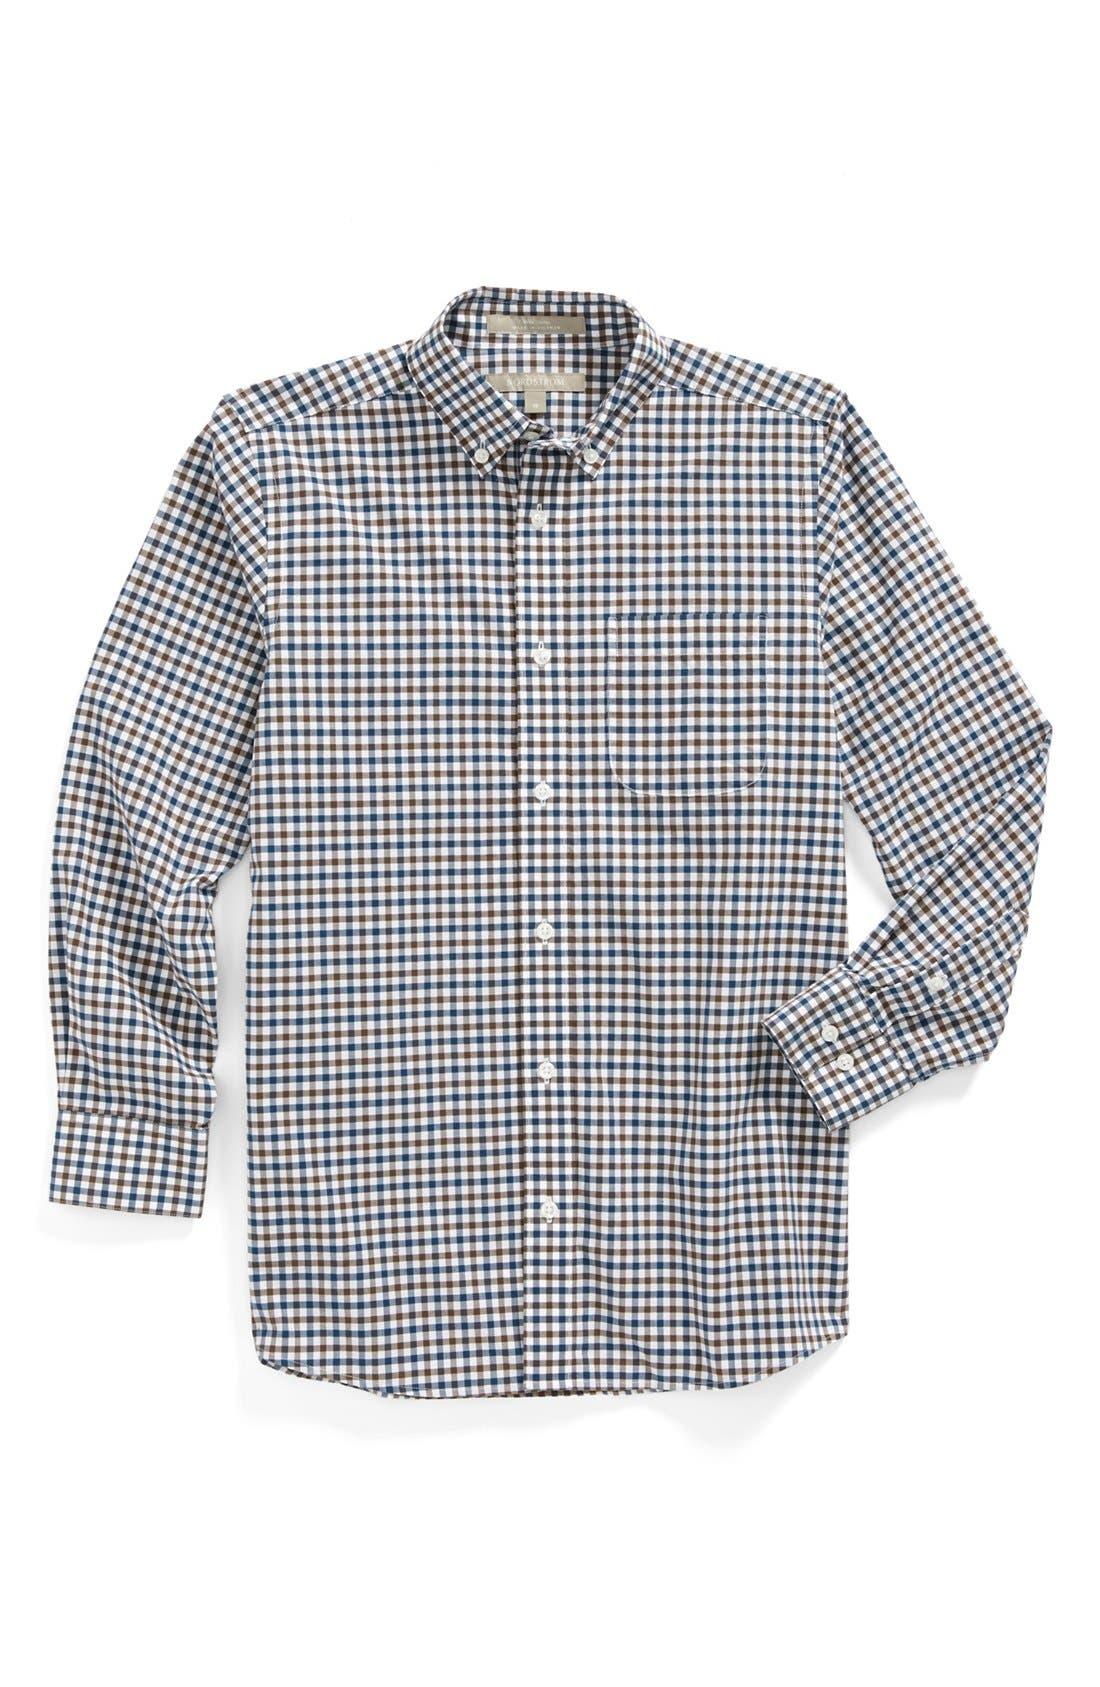 Alternate Image 1 Selected - Nordstrom Gingham Dress Shirt (Big Boys)